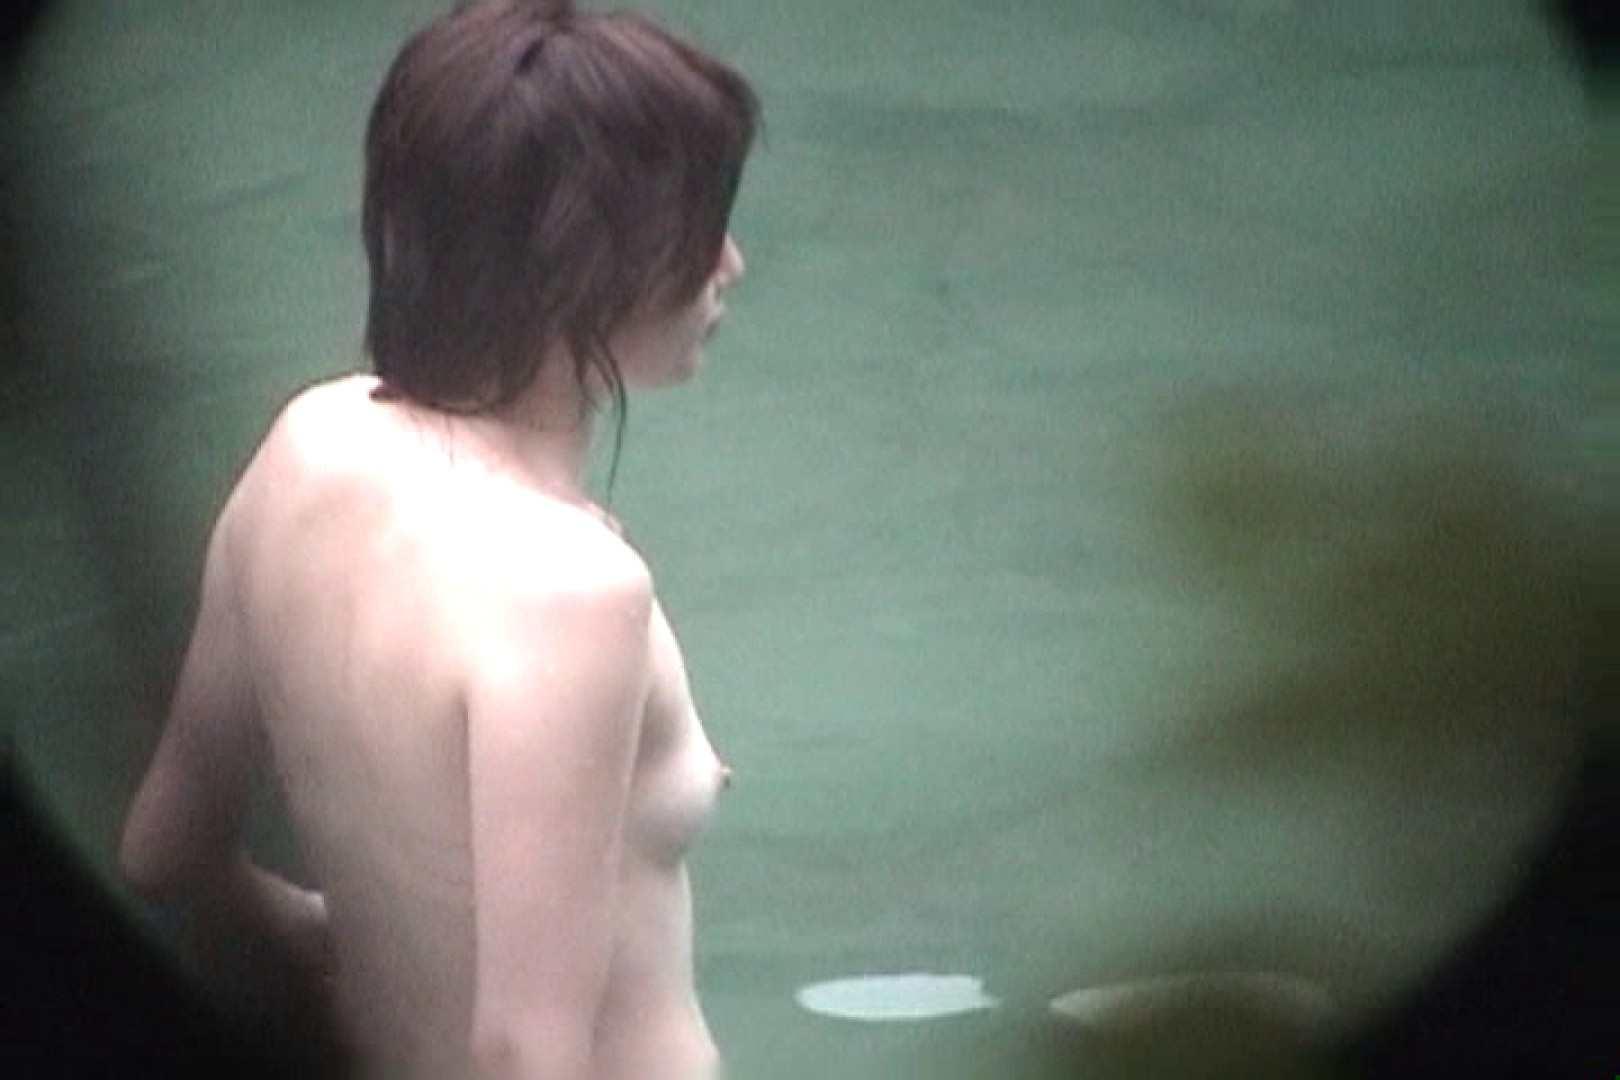 Aquaな露天風呂Vol.71【VIP限定】 OLエロ画像 覗きオメコ動画キャプチャ 68PICs 62